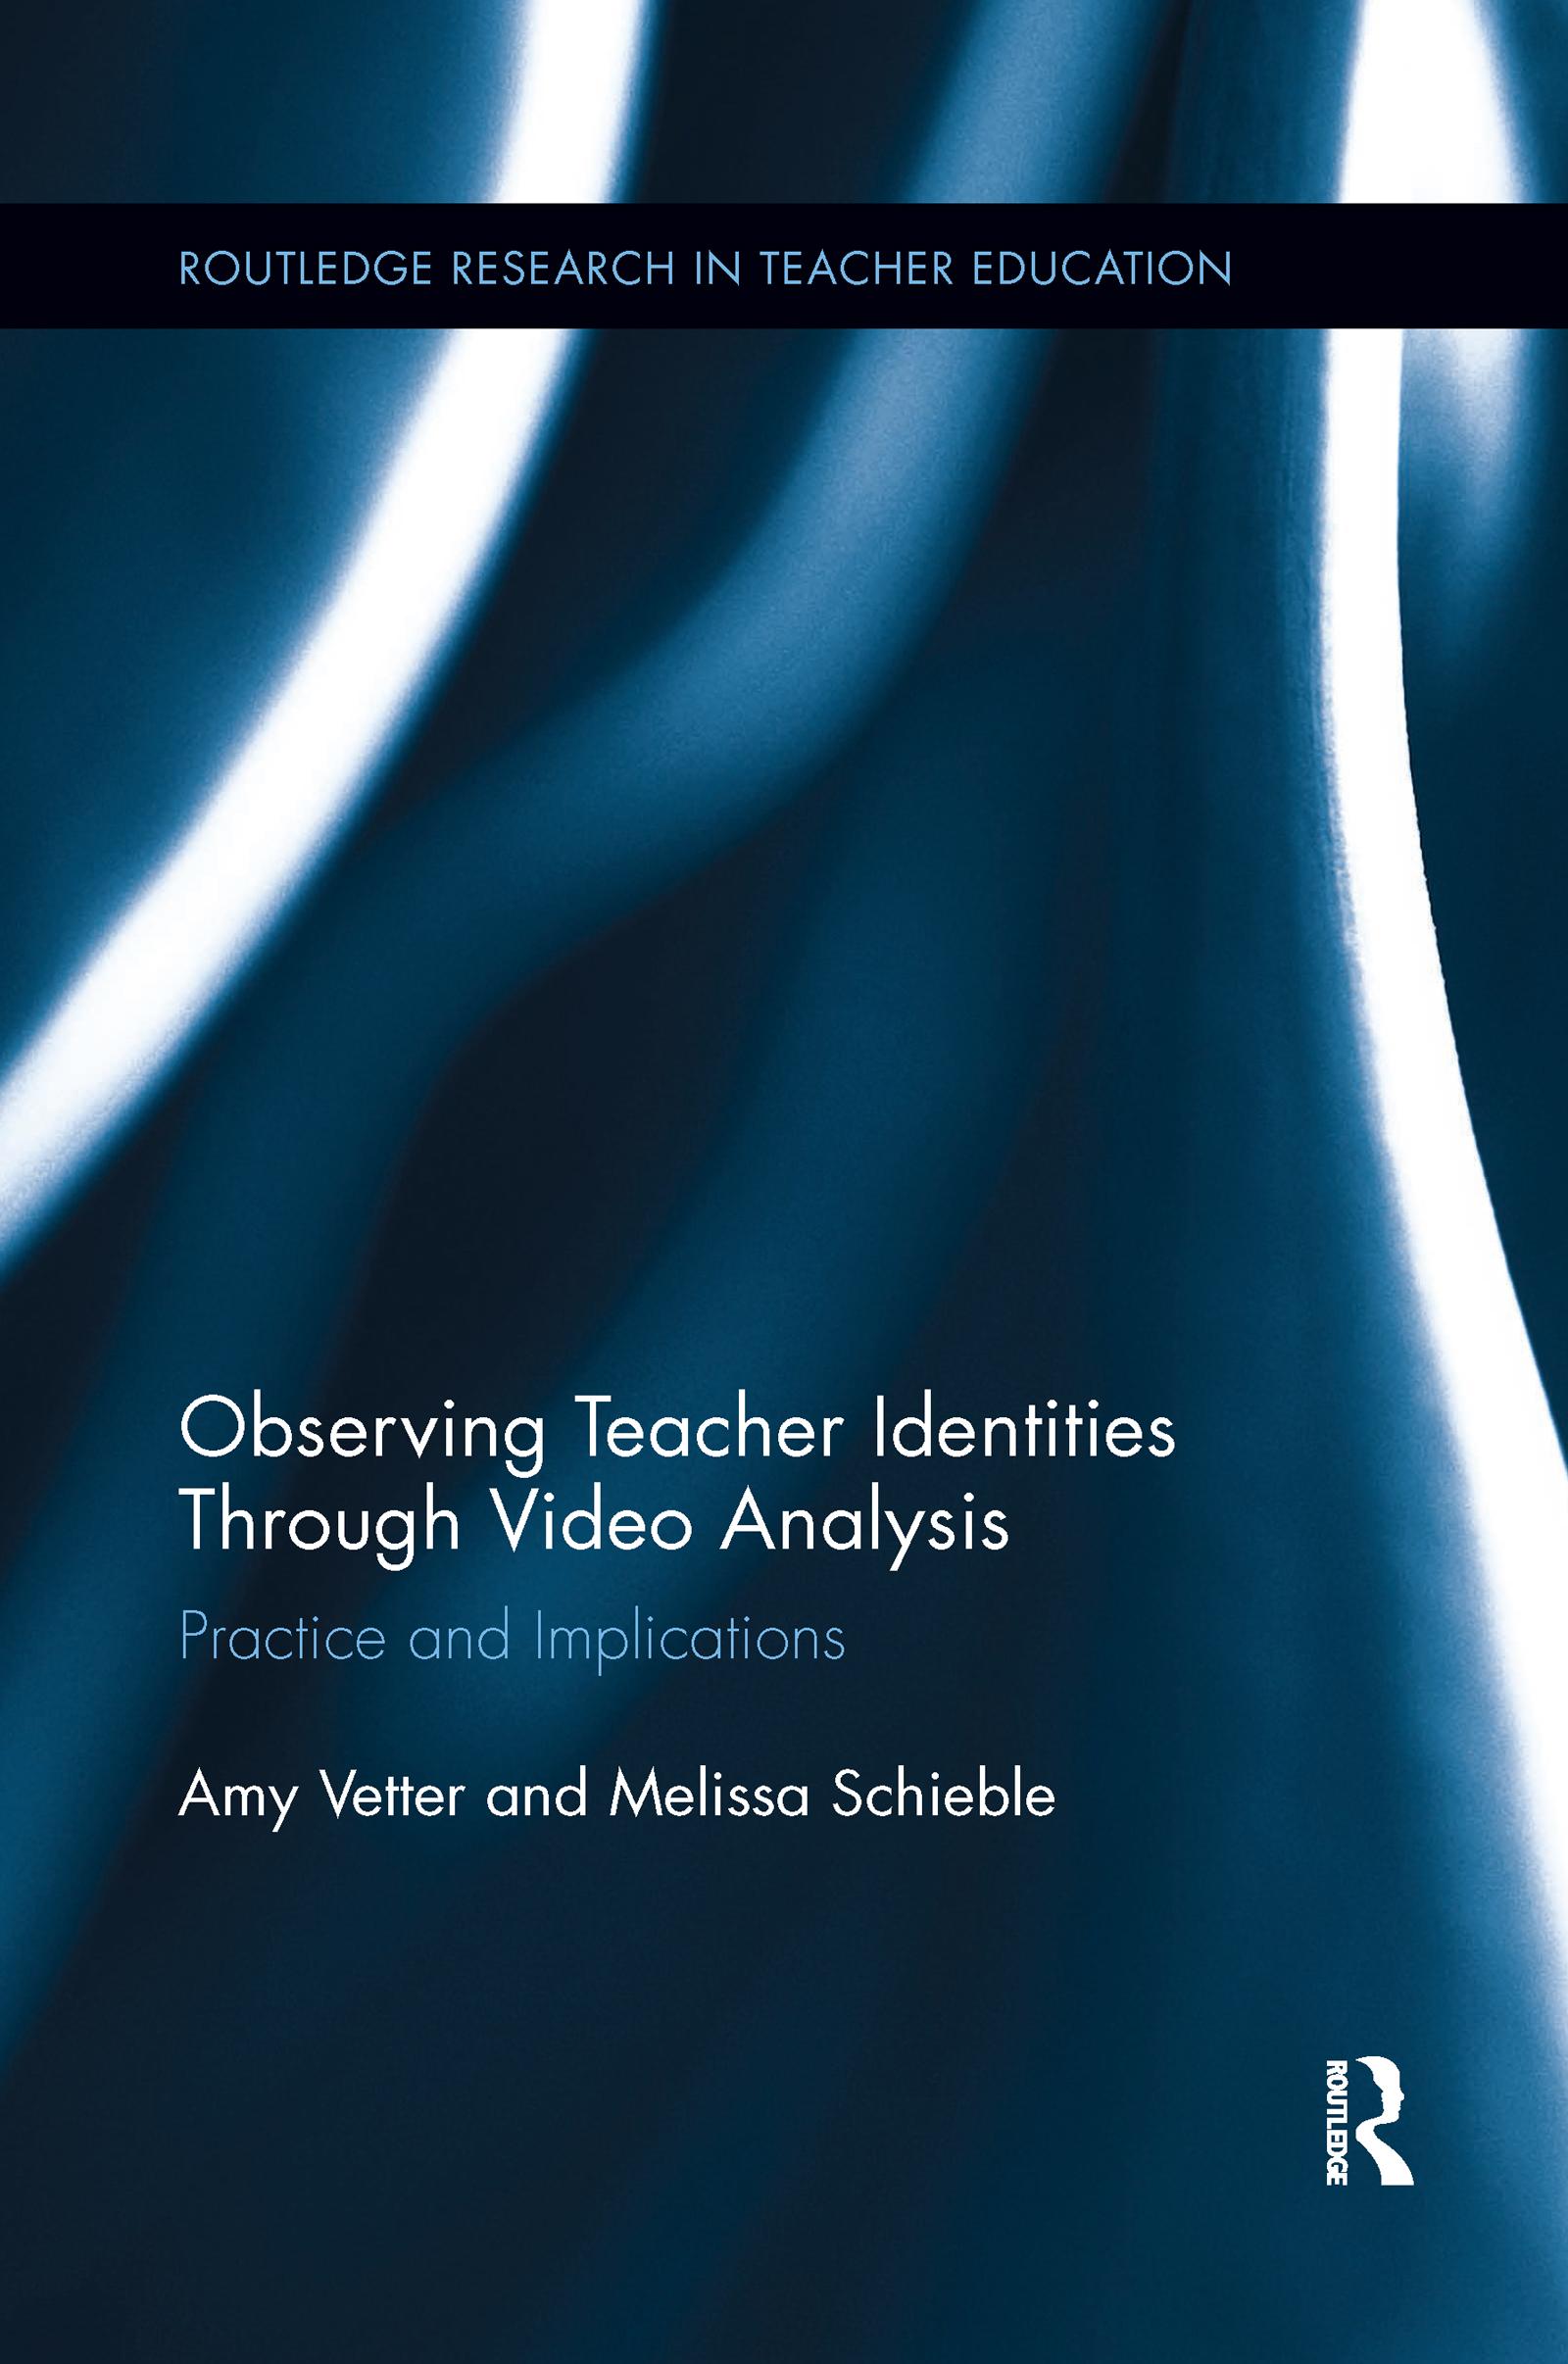 Observing Teacher Identities through Video Analysis